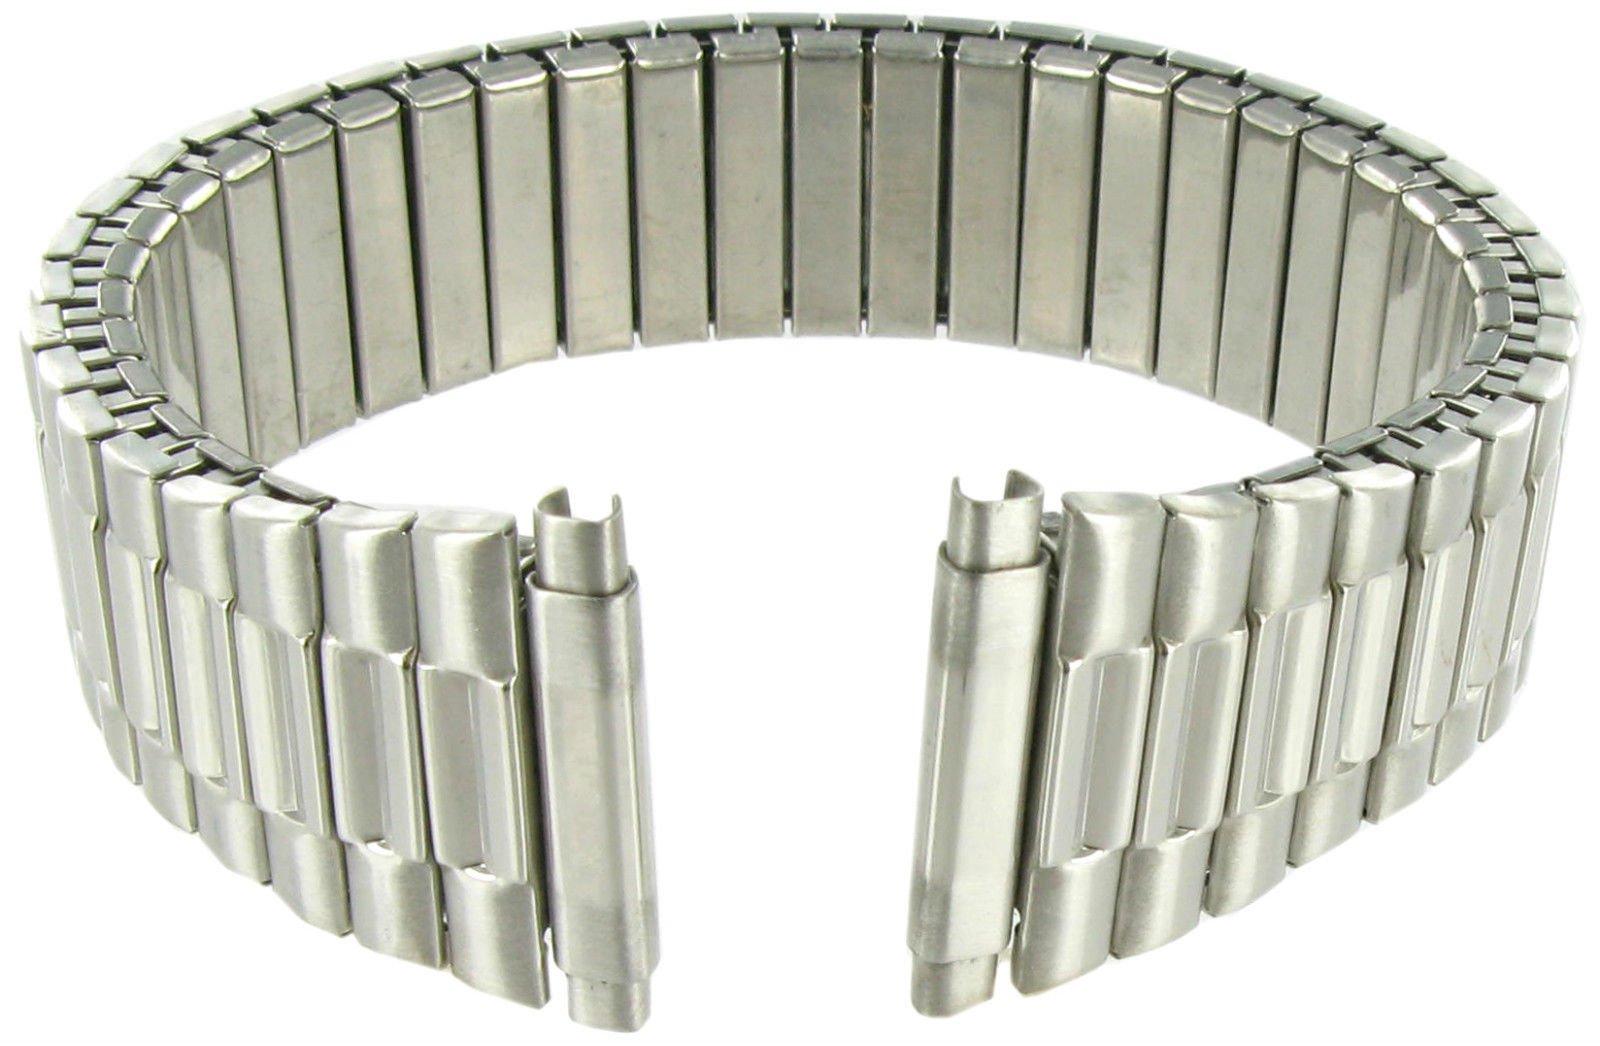 17-21mm Kreisler Twist-O-Flex Silver Tone Stainless Expansion Watch Band Long